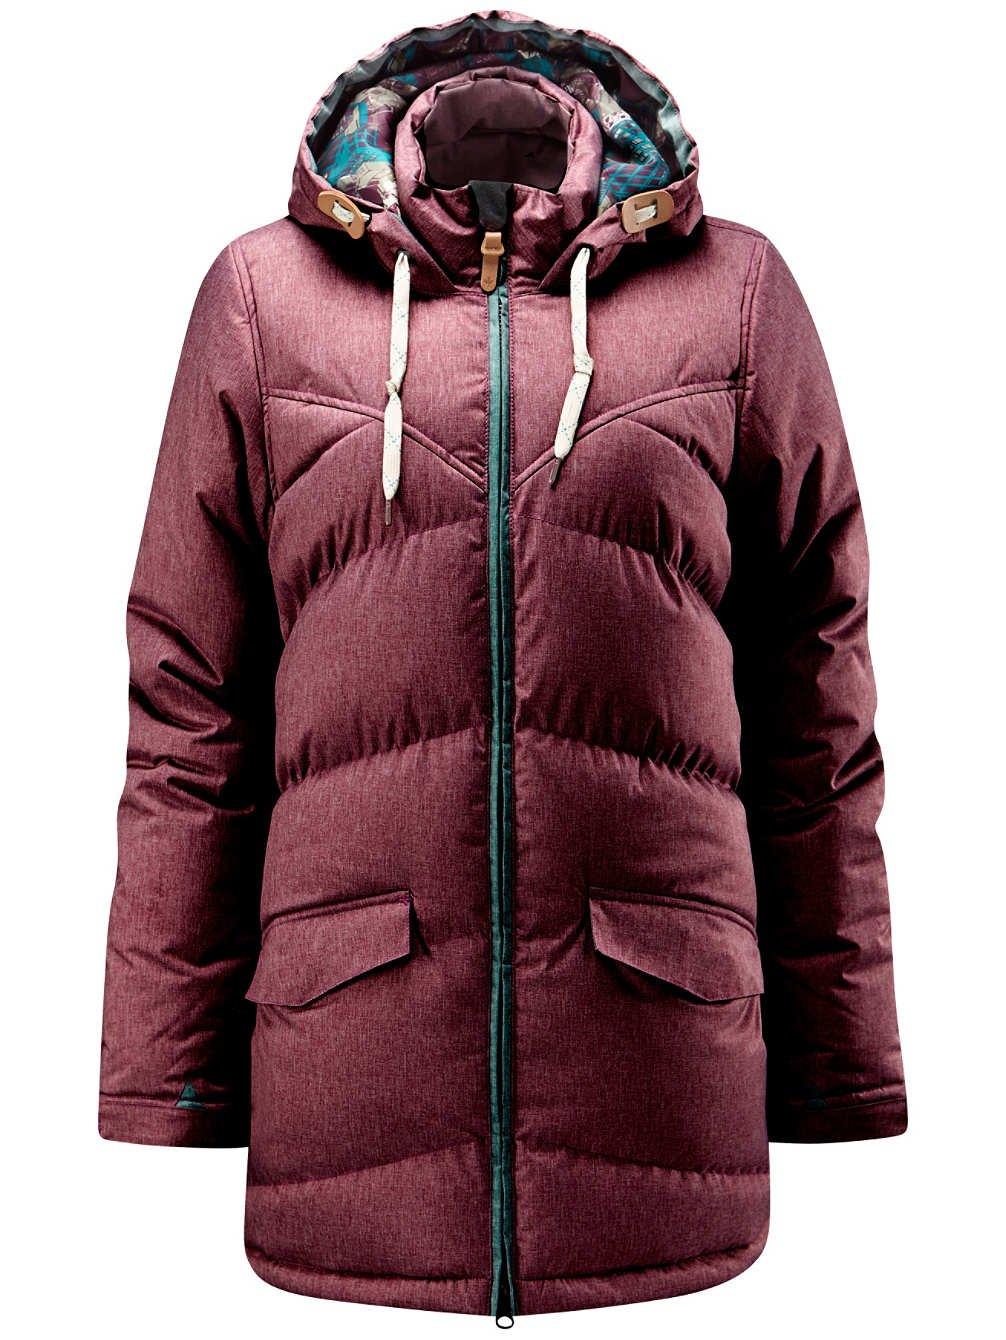 Westbeach Ego - Chaqueta de Snowboard Miller búfer Jacket ...